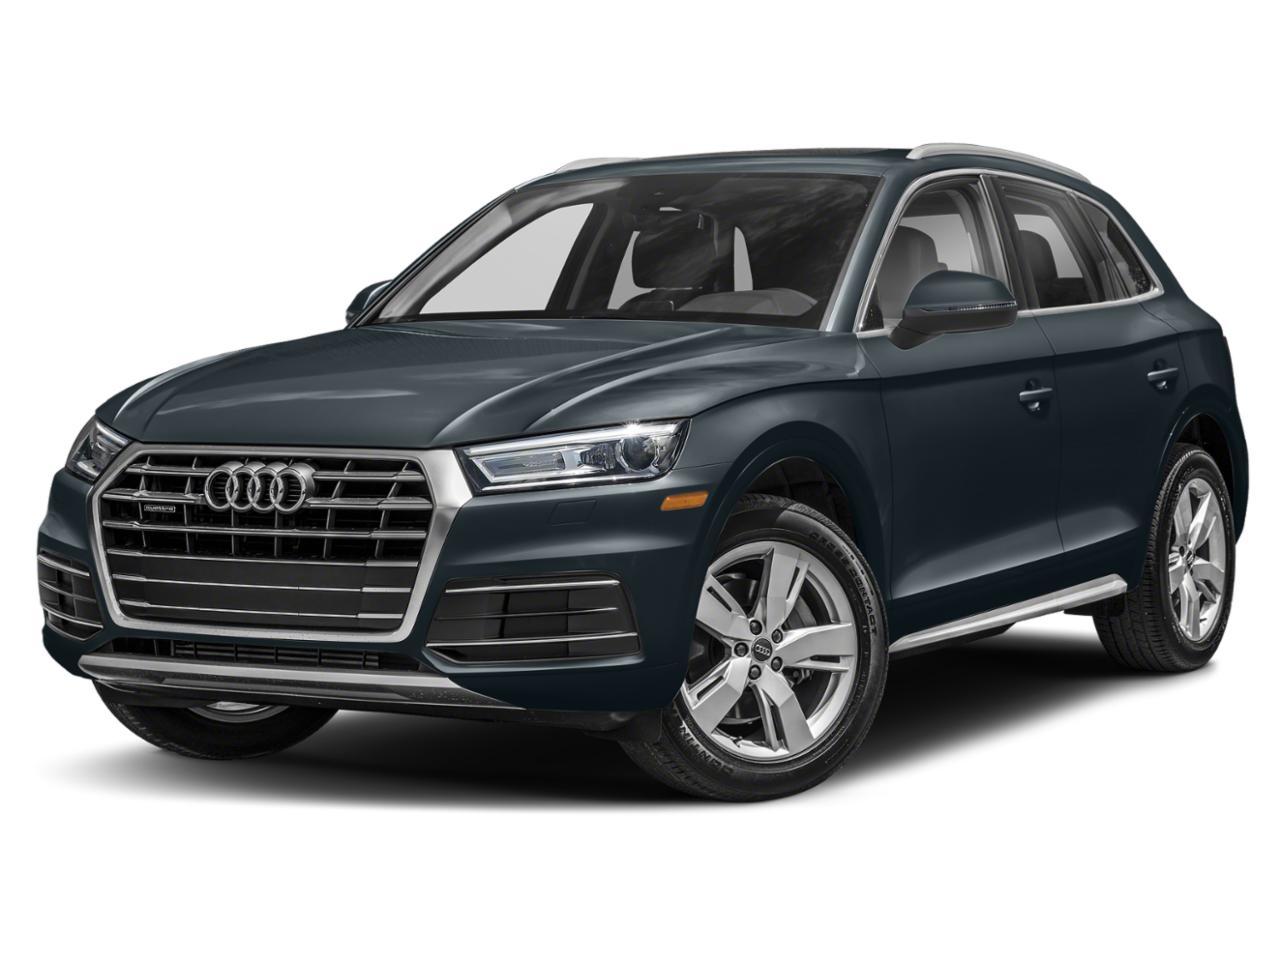 2019 Audi Q5 Vehicle Photo in Grapevine, TX 76051